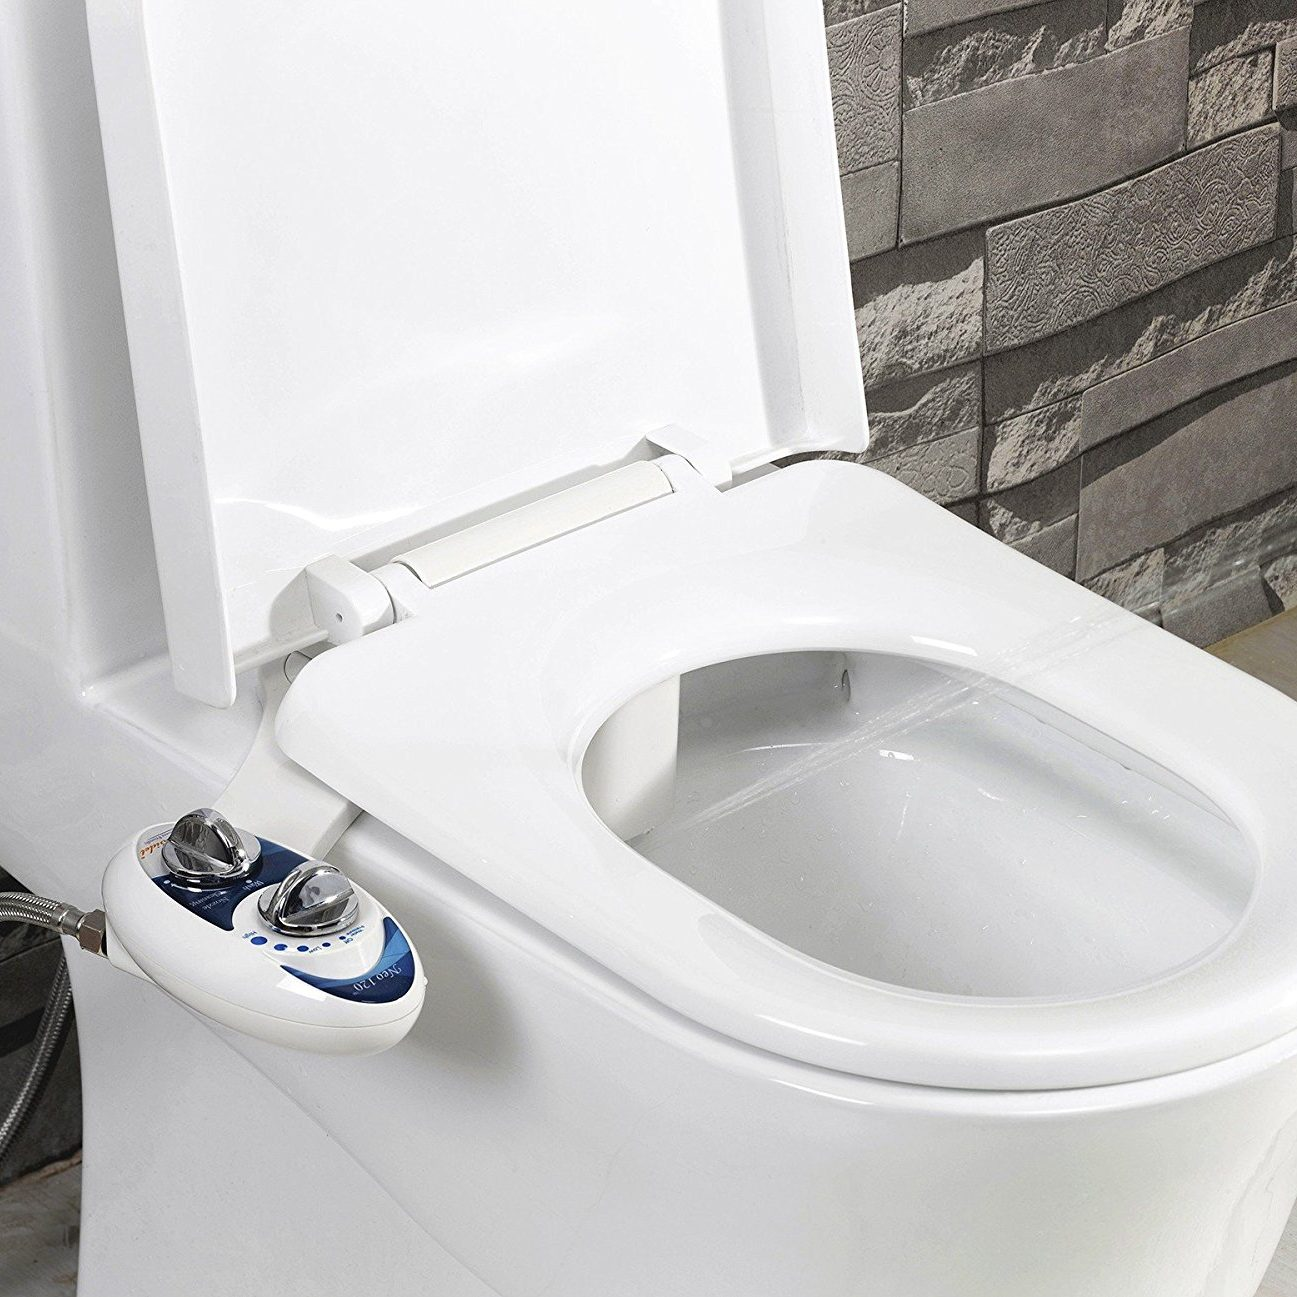 Pleasing Best Bidet Toilet Seat Attachment Reviews Toilet Review Guide Pabps2019 Chair Design Images Pabps2019Com